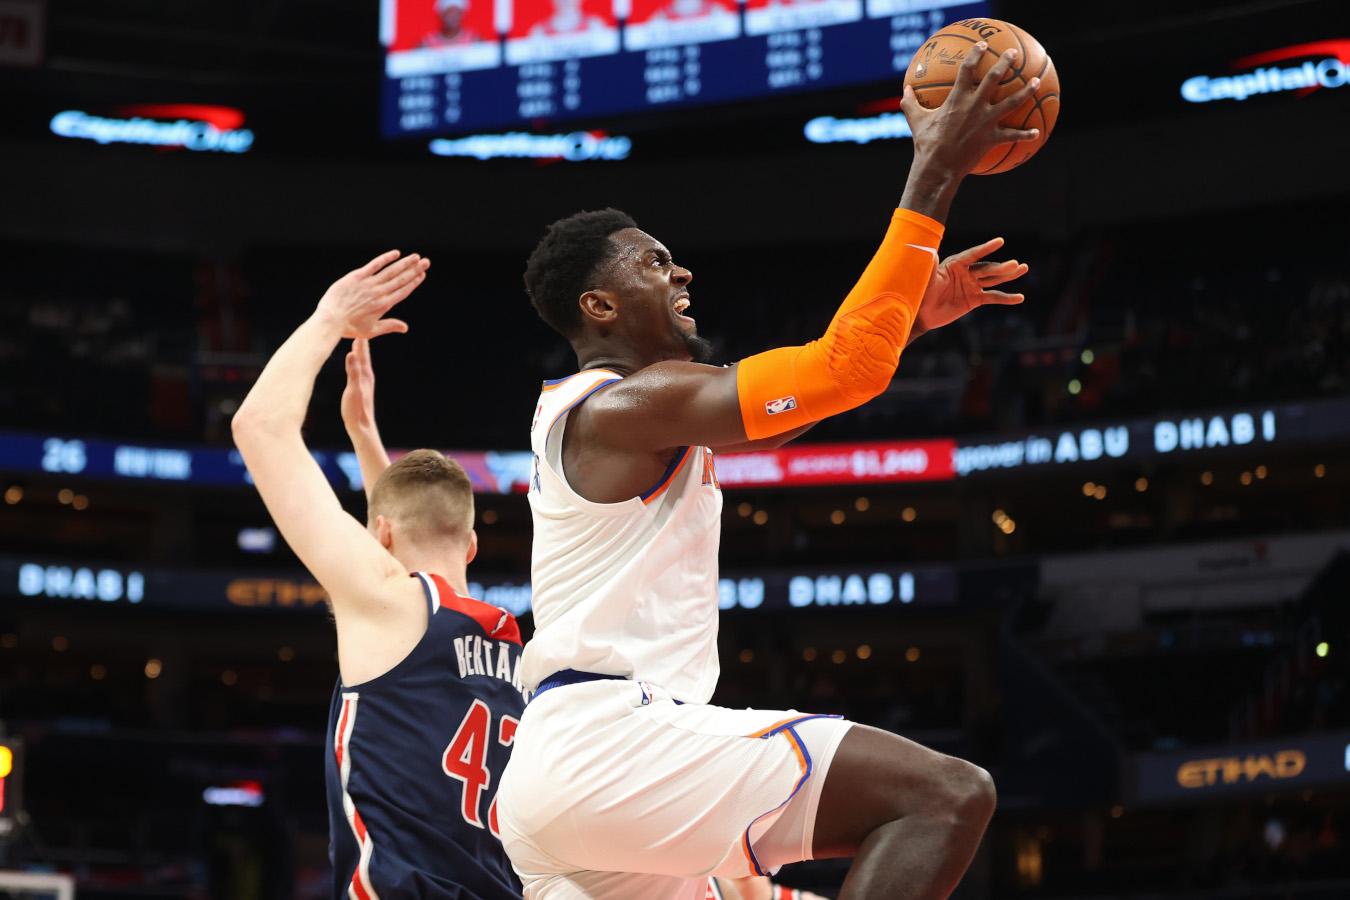 Bobby Portis, New York Knicks